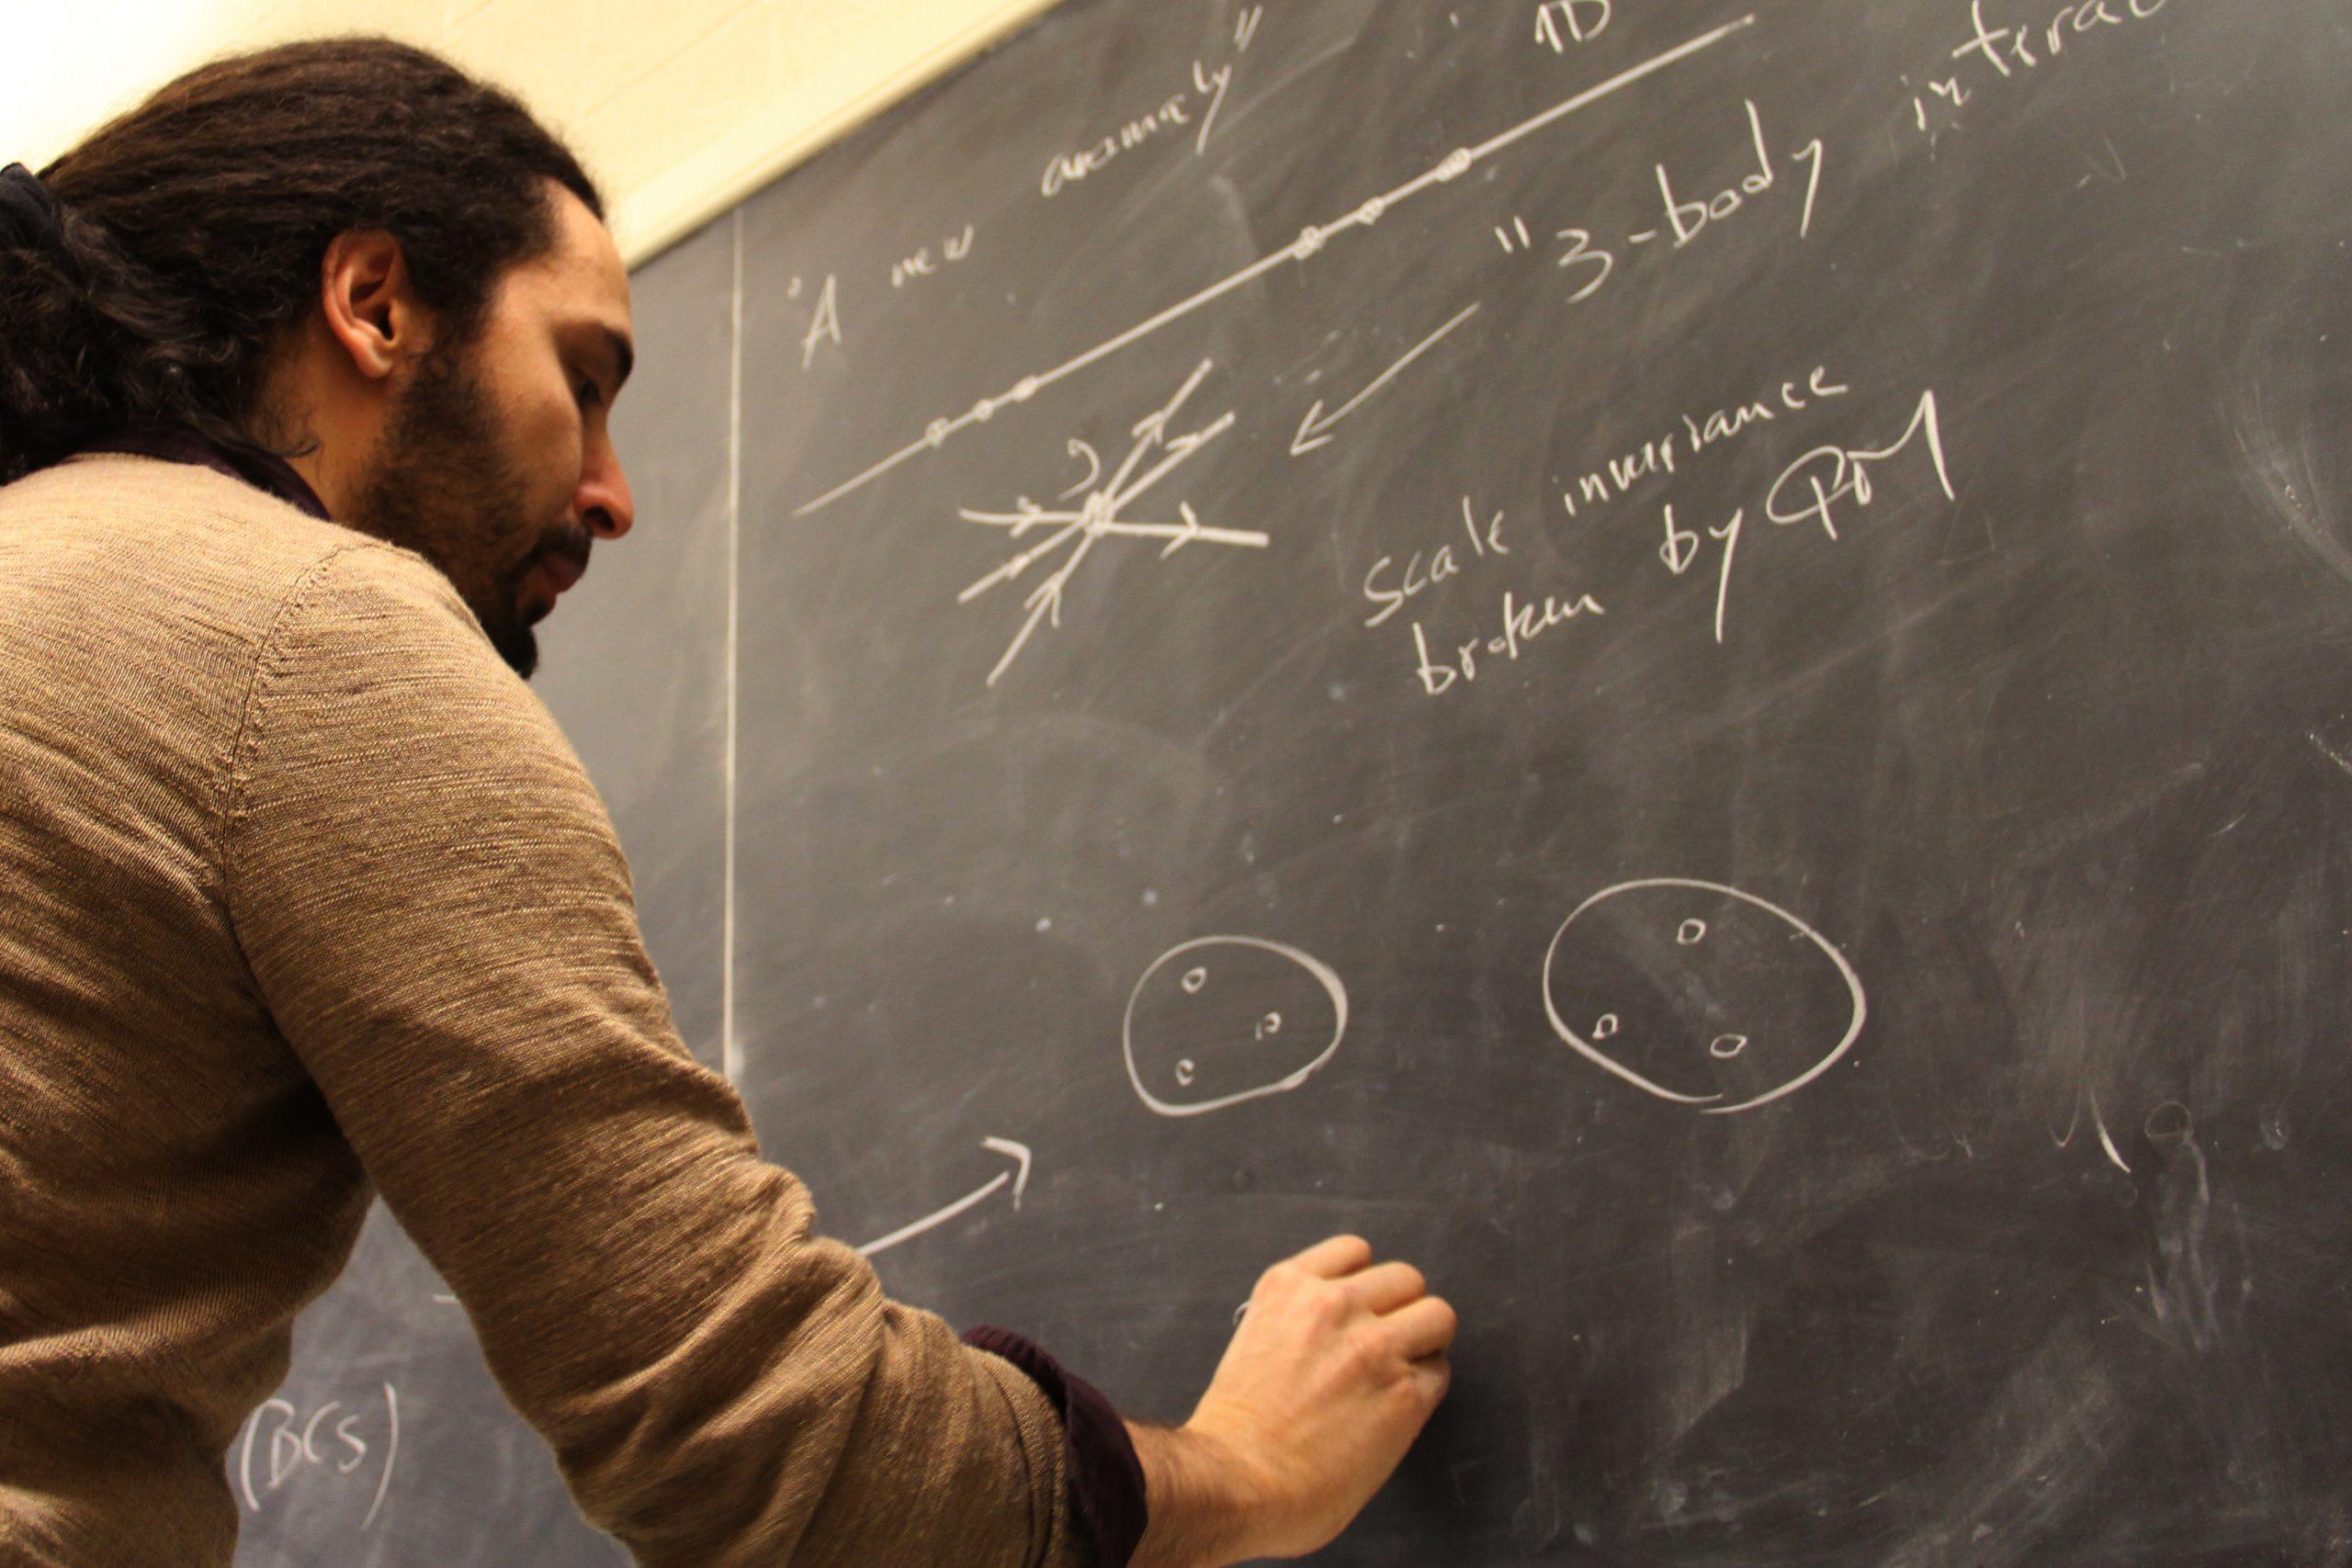 Professor writes on a black board.